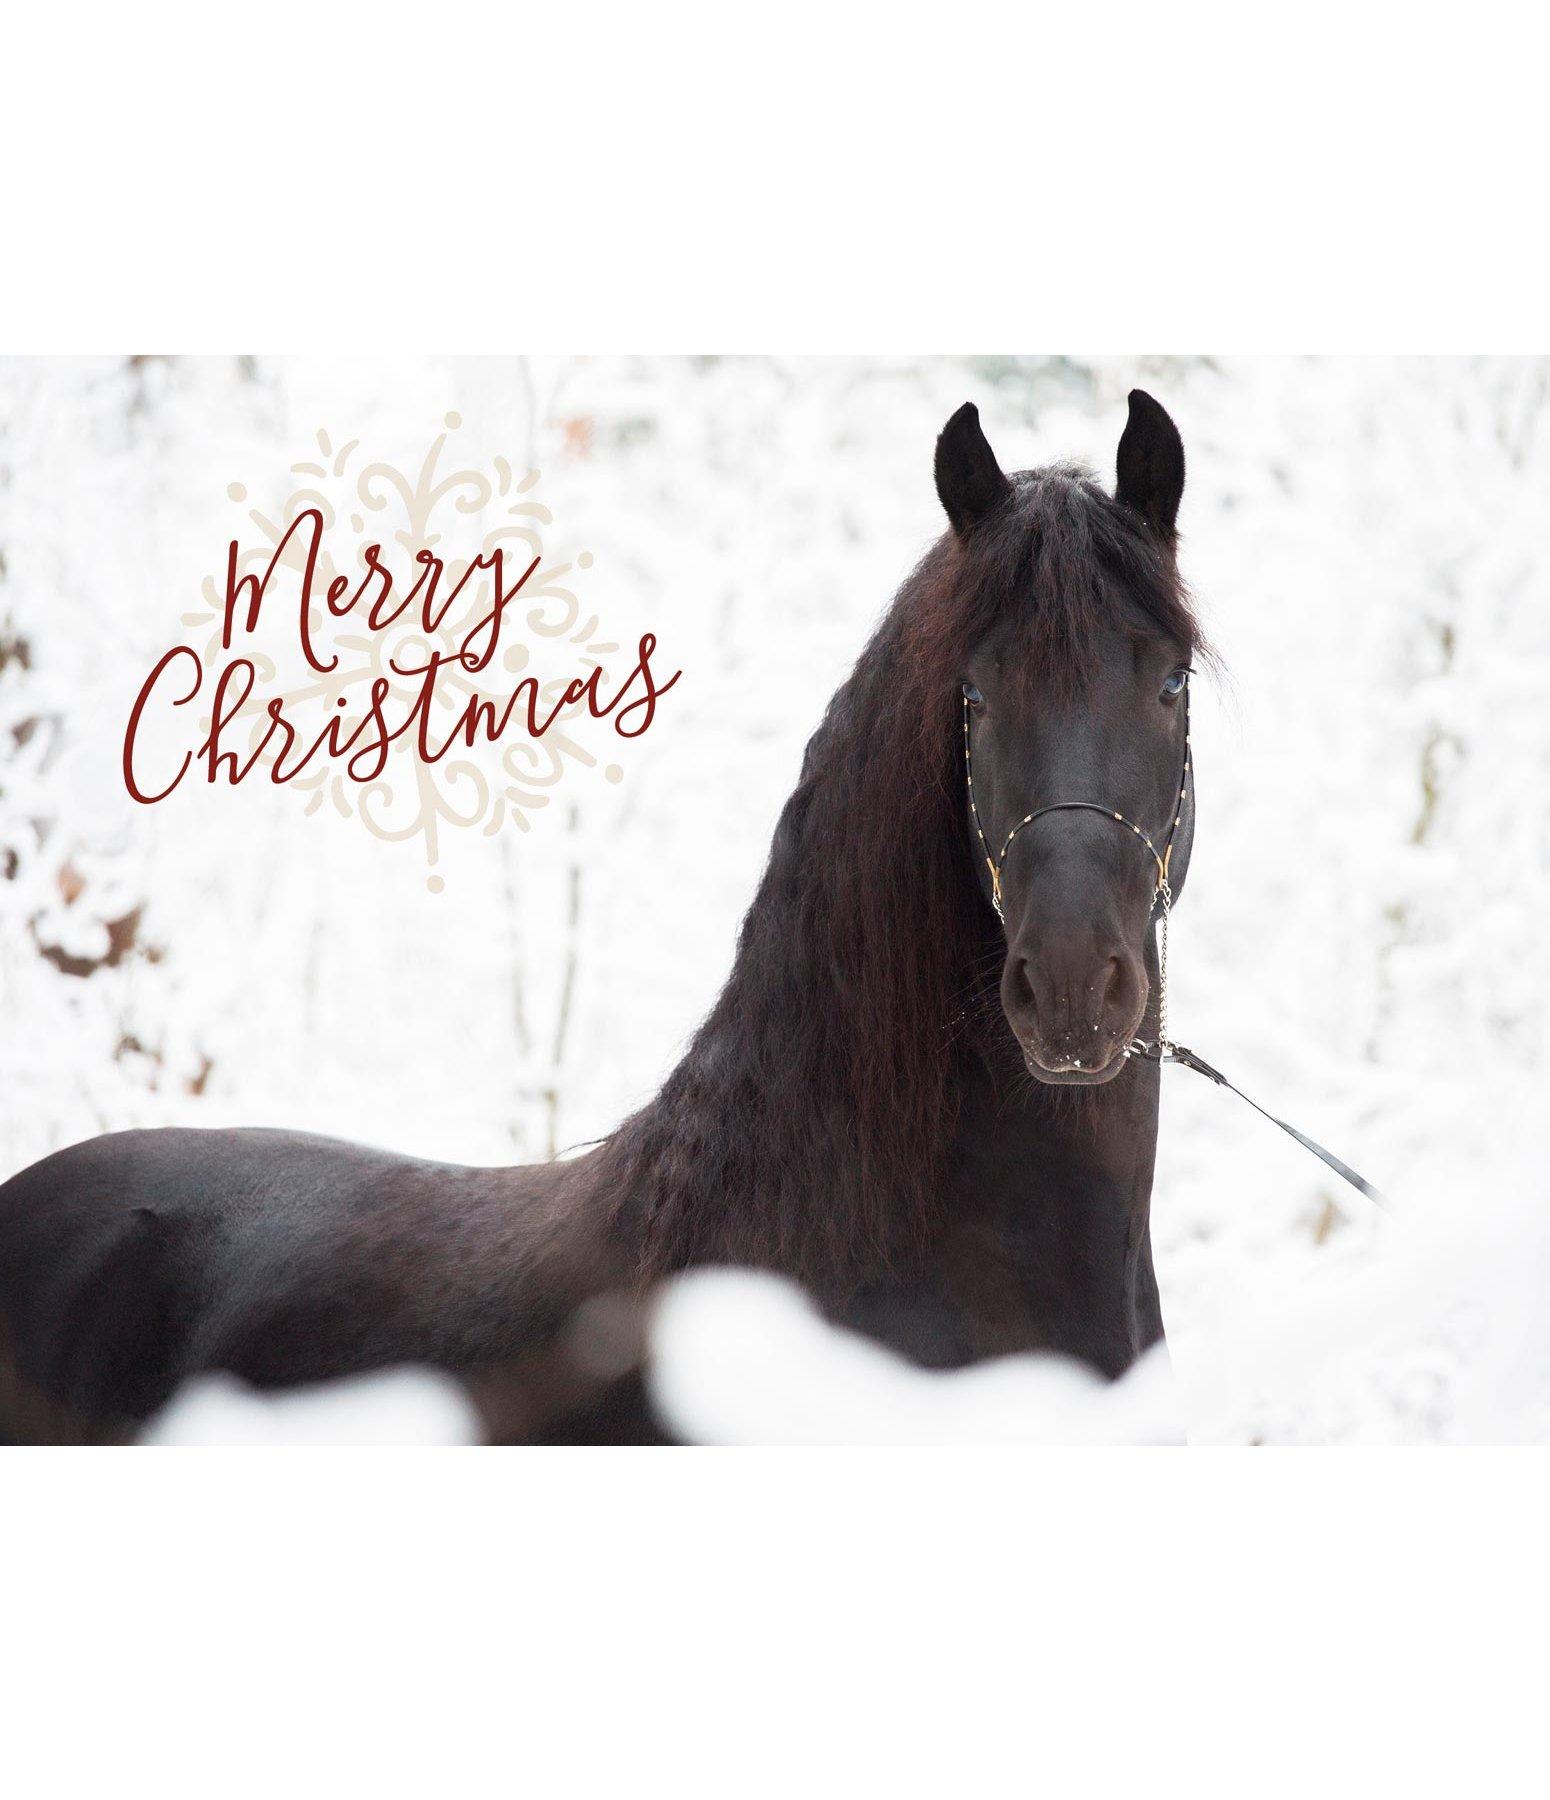 Greeting Card Merry Christmas Iv Kramer Equestrian